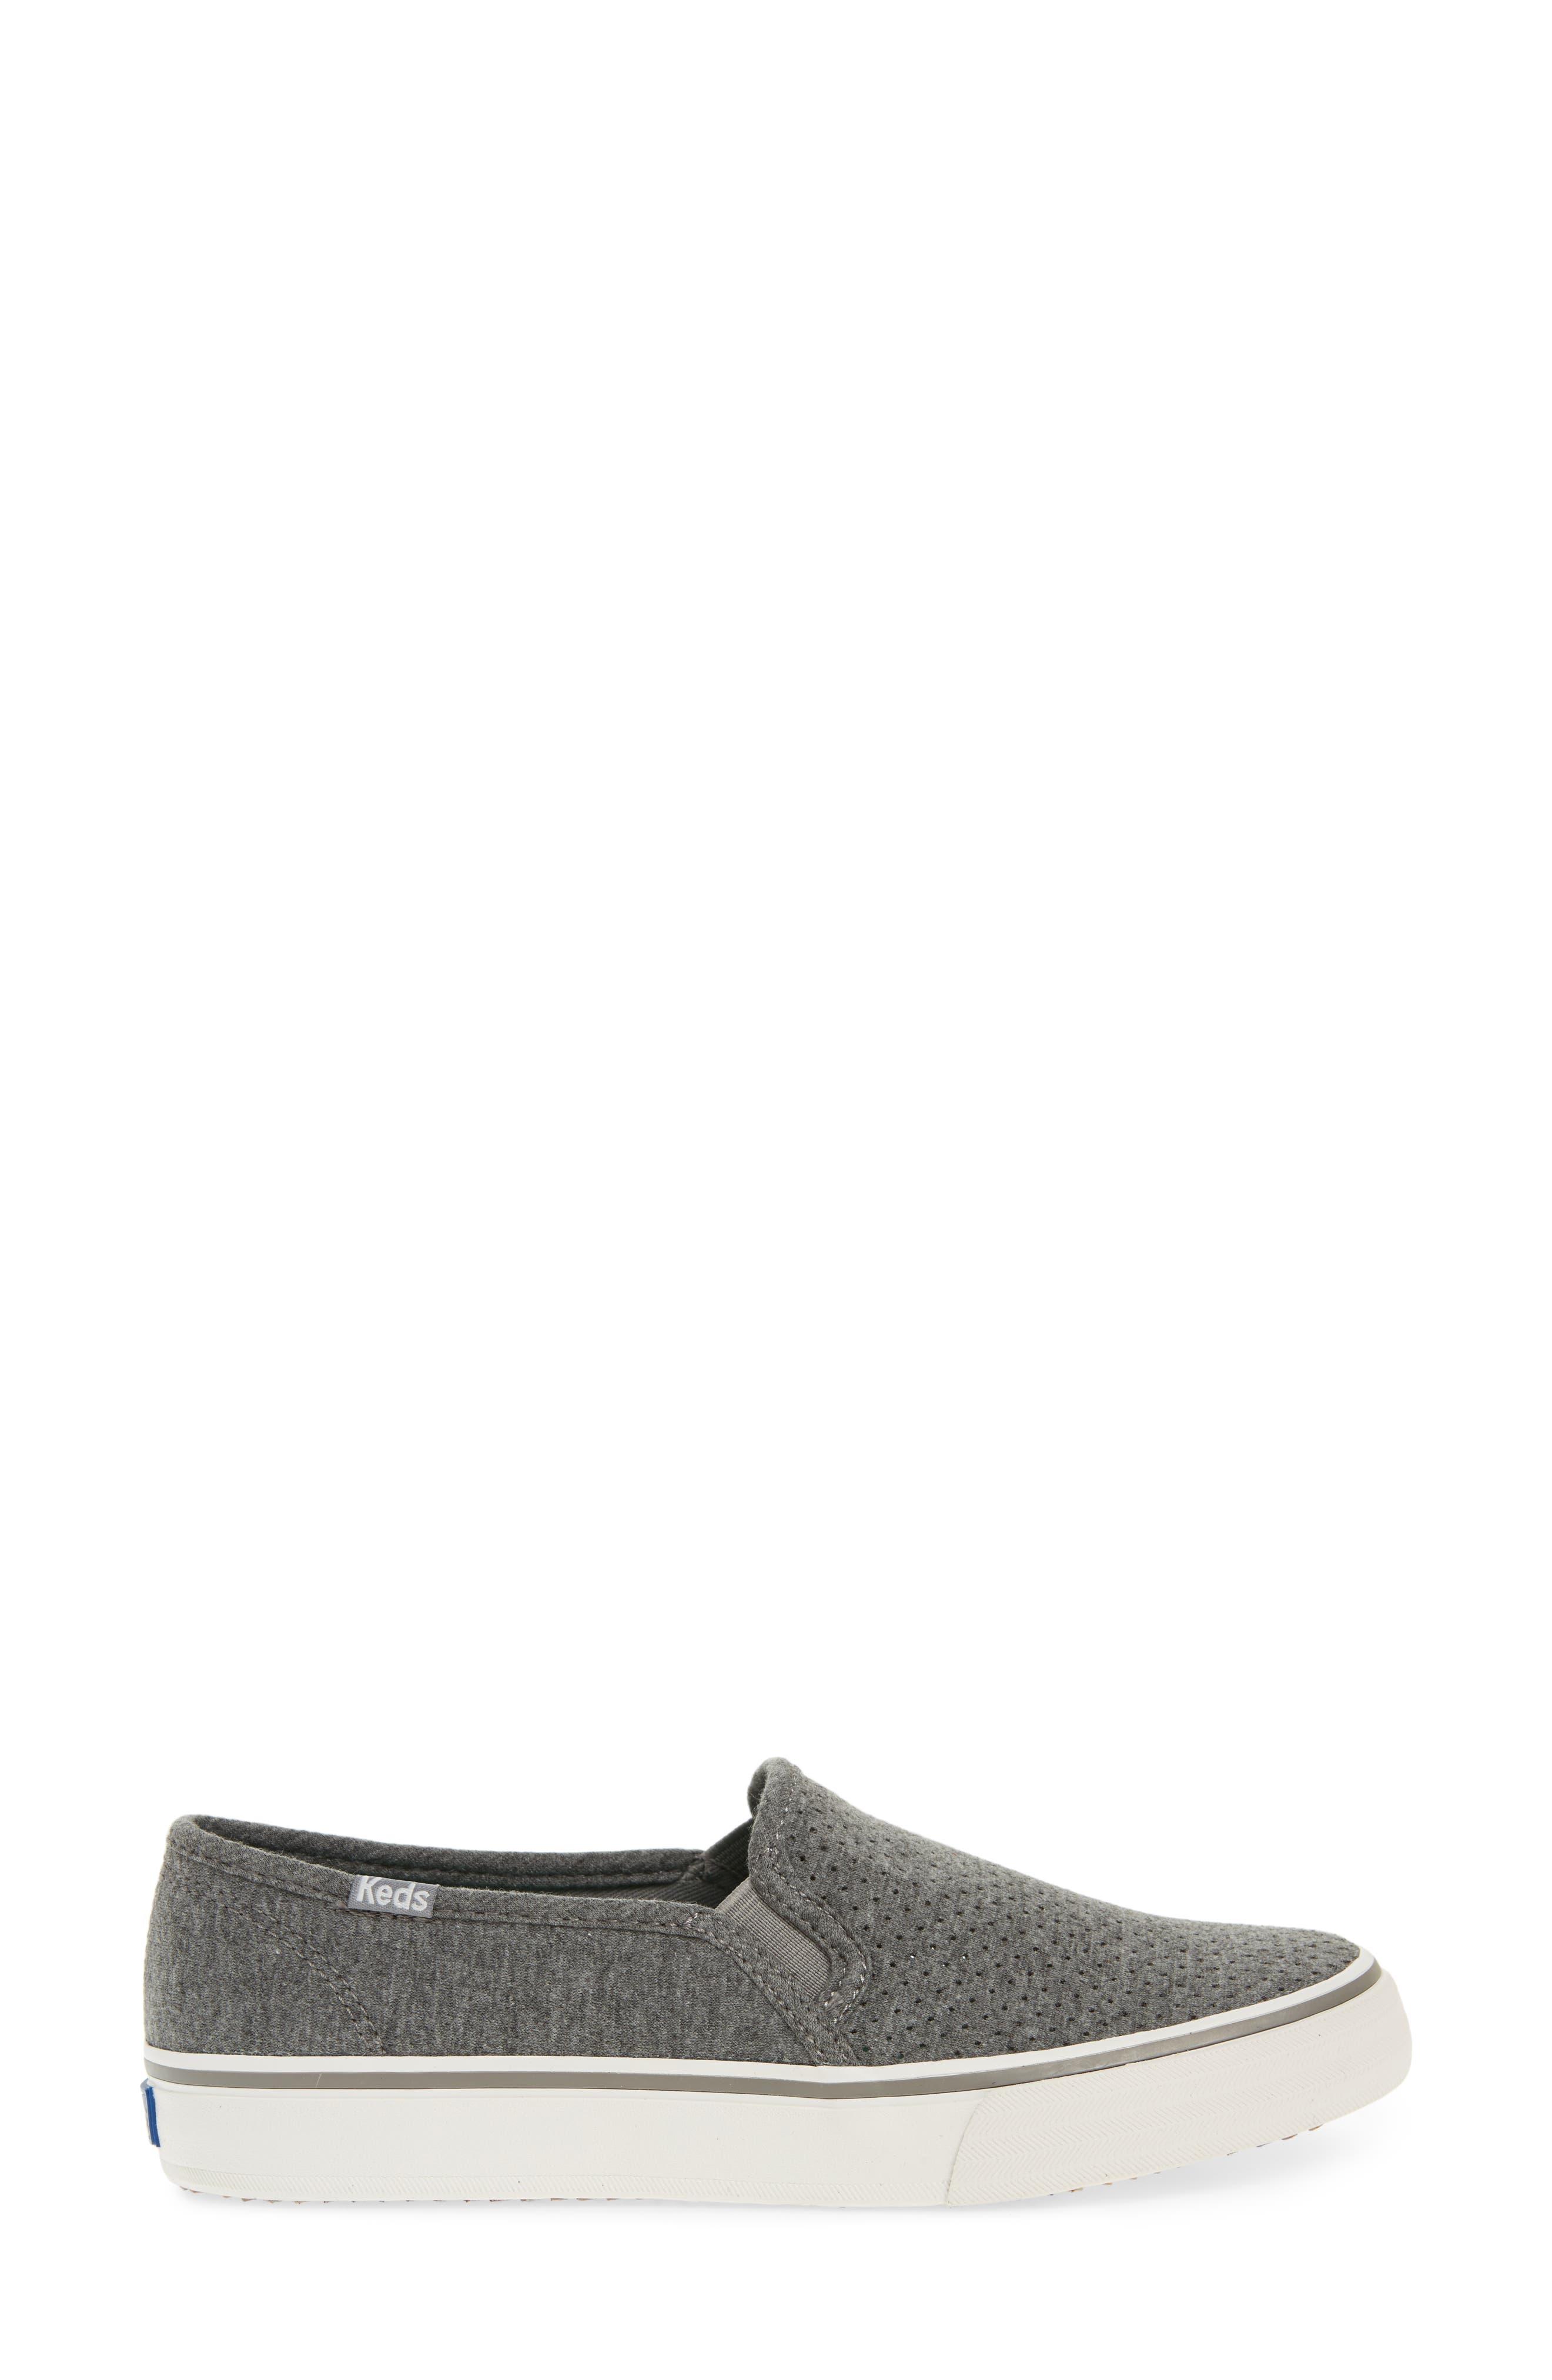 Double Decker Perforated Slip-On Sneaker,                             Alternate thumbnail 3, color,                             021